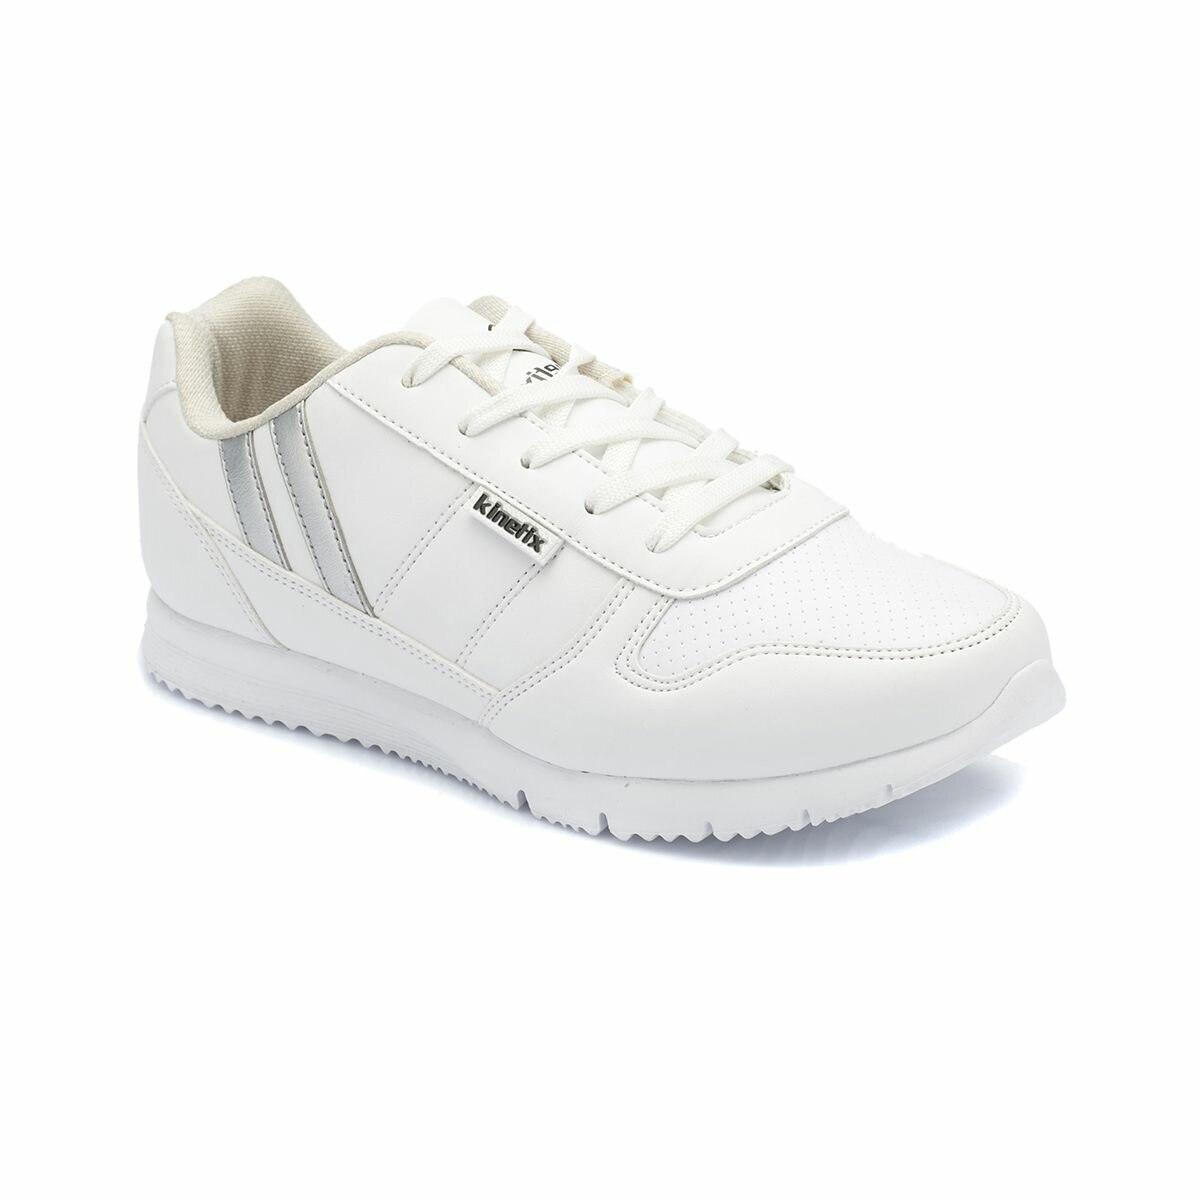 FLO CORDELIA White Women 'S Sneaker Shoes KINETIX